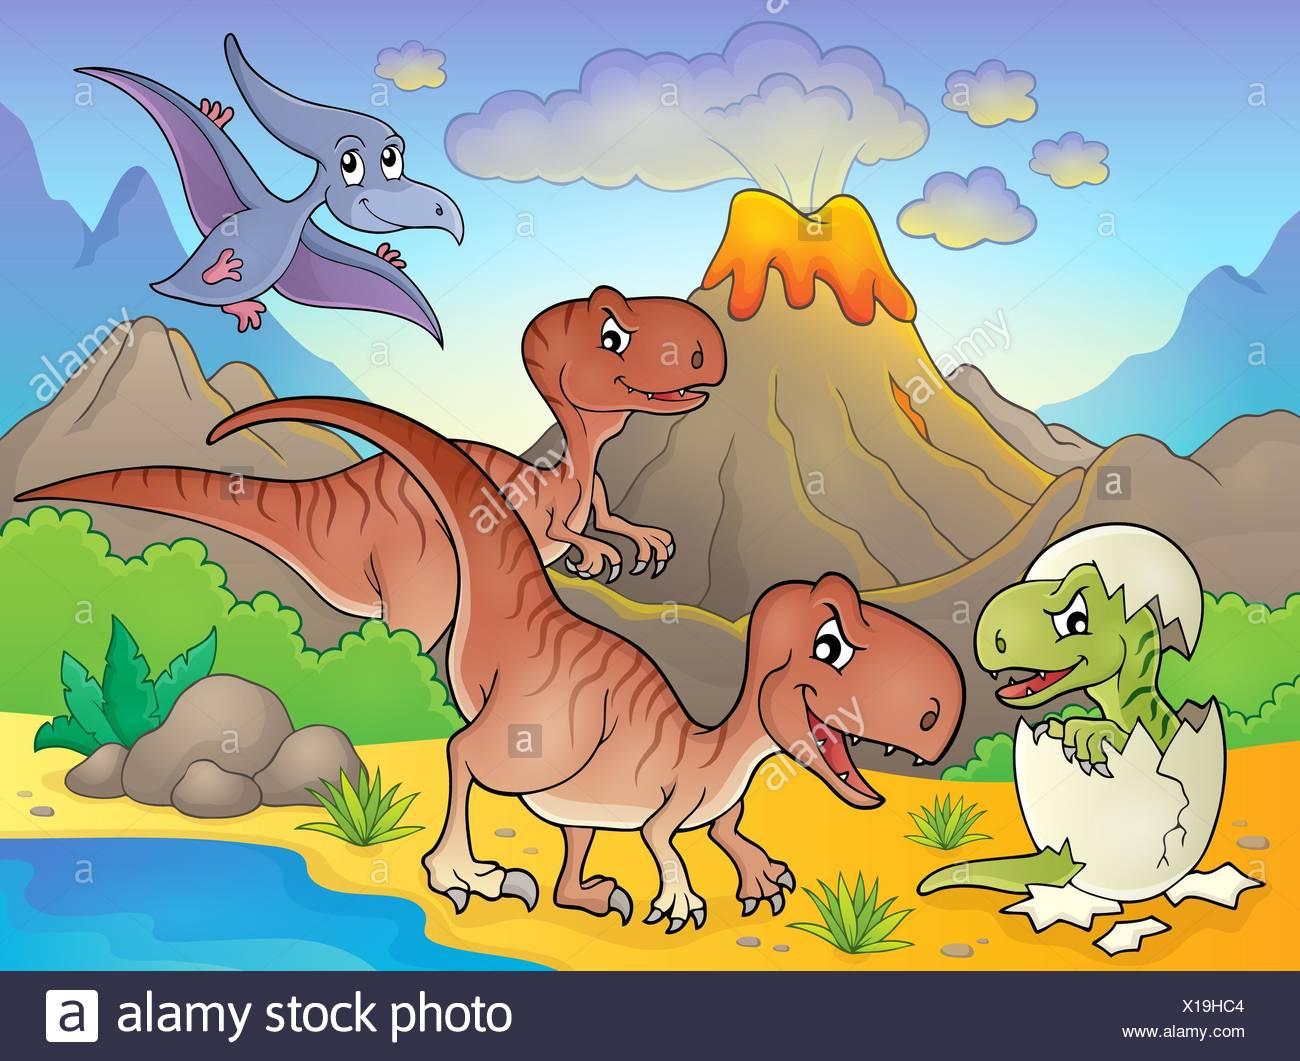 Dinosaur topic image 6 - Stock Image